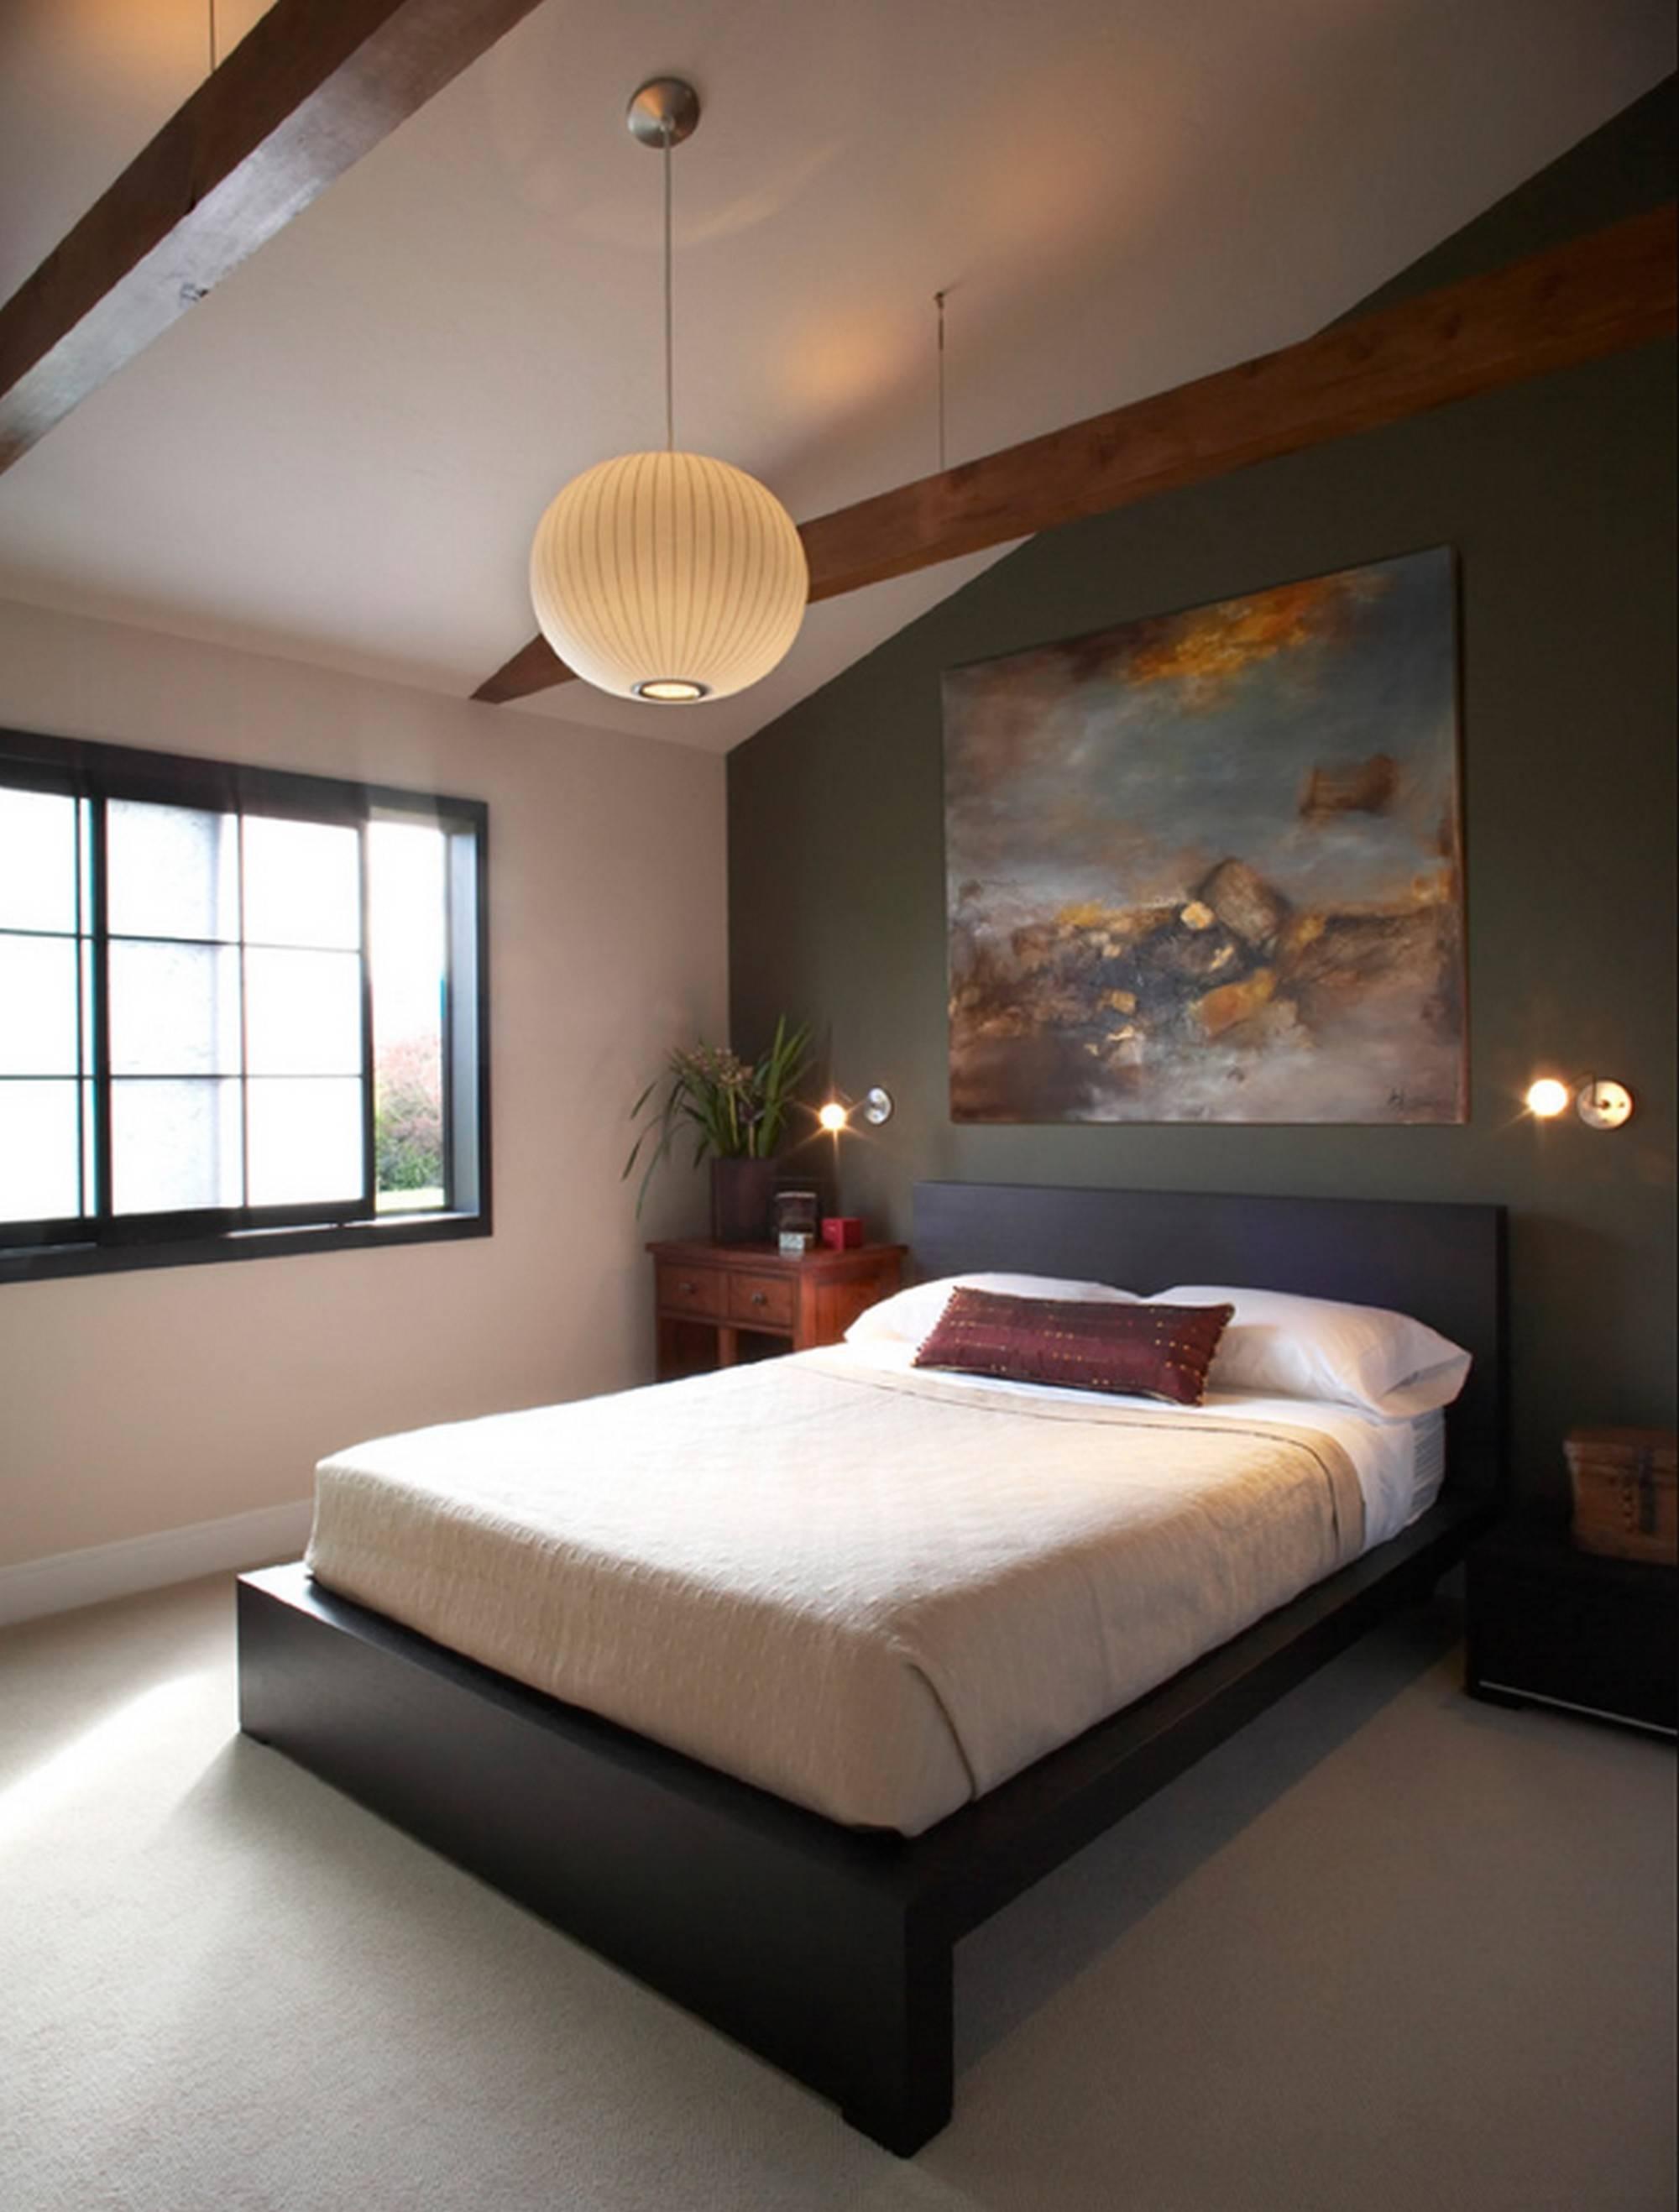 Woven Ball Pendant Light For Bedroom Design With Sloped Ceiling Inside Pendant Lights For Sloped Ceiling (View 3 of 15)